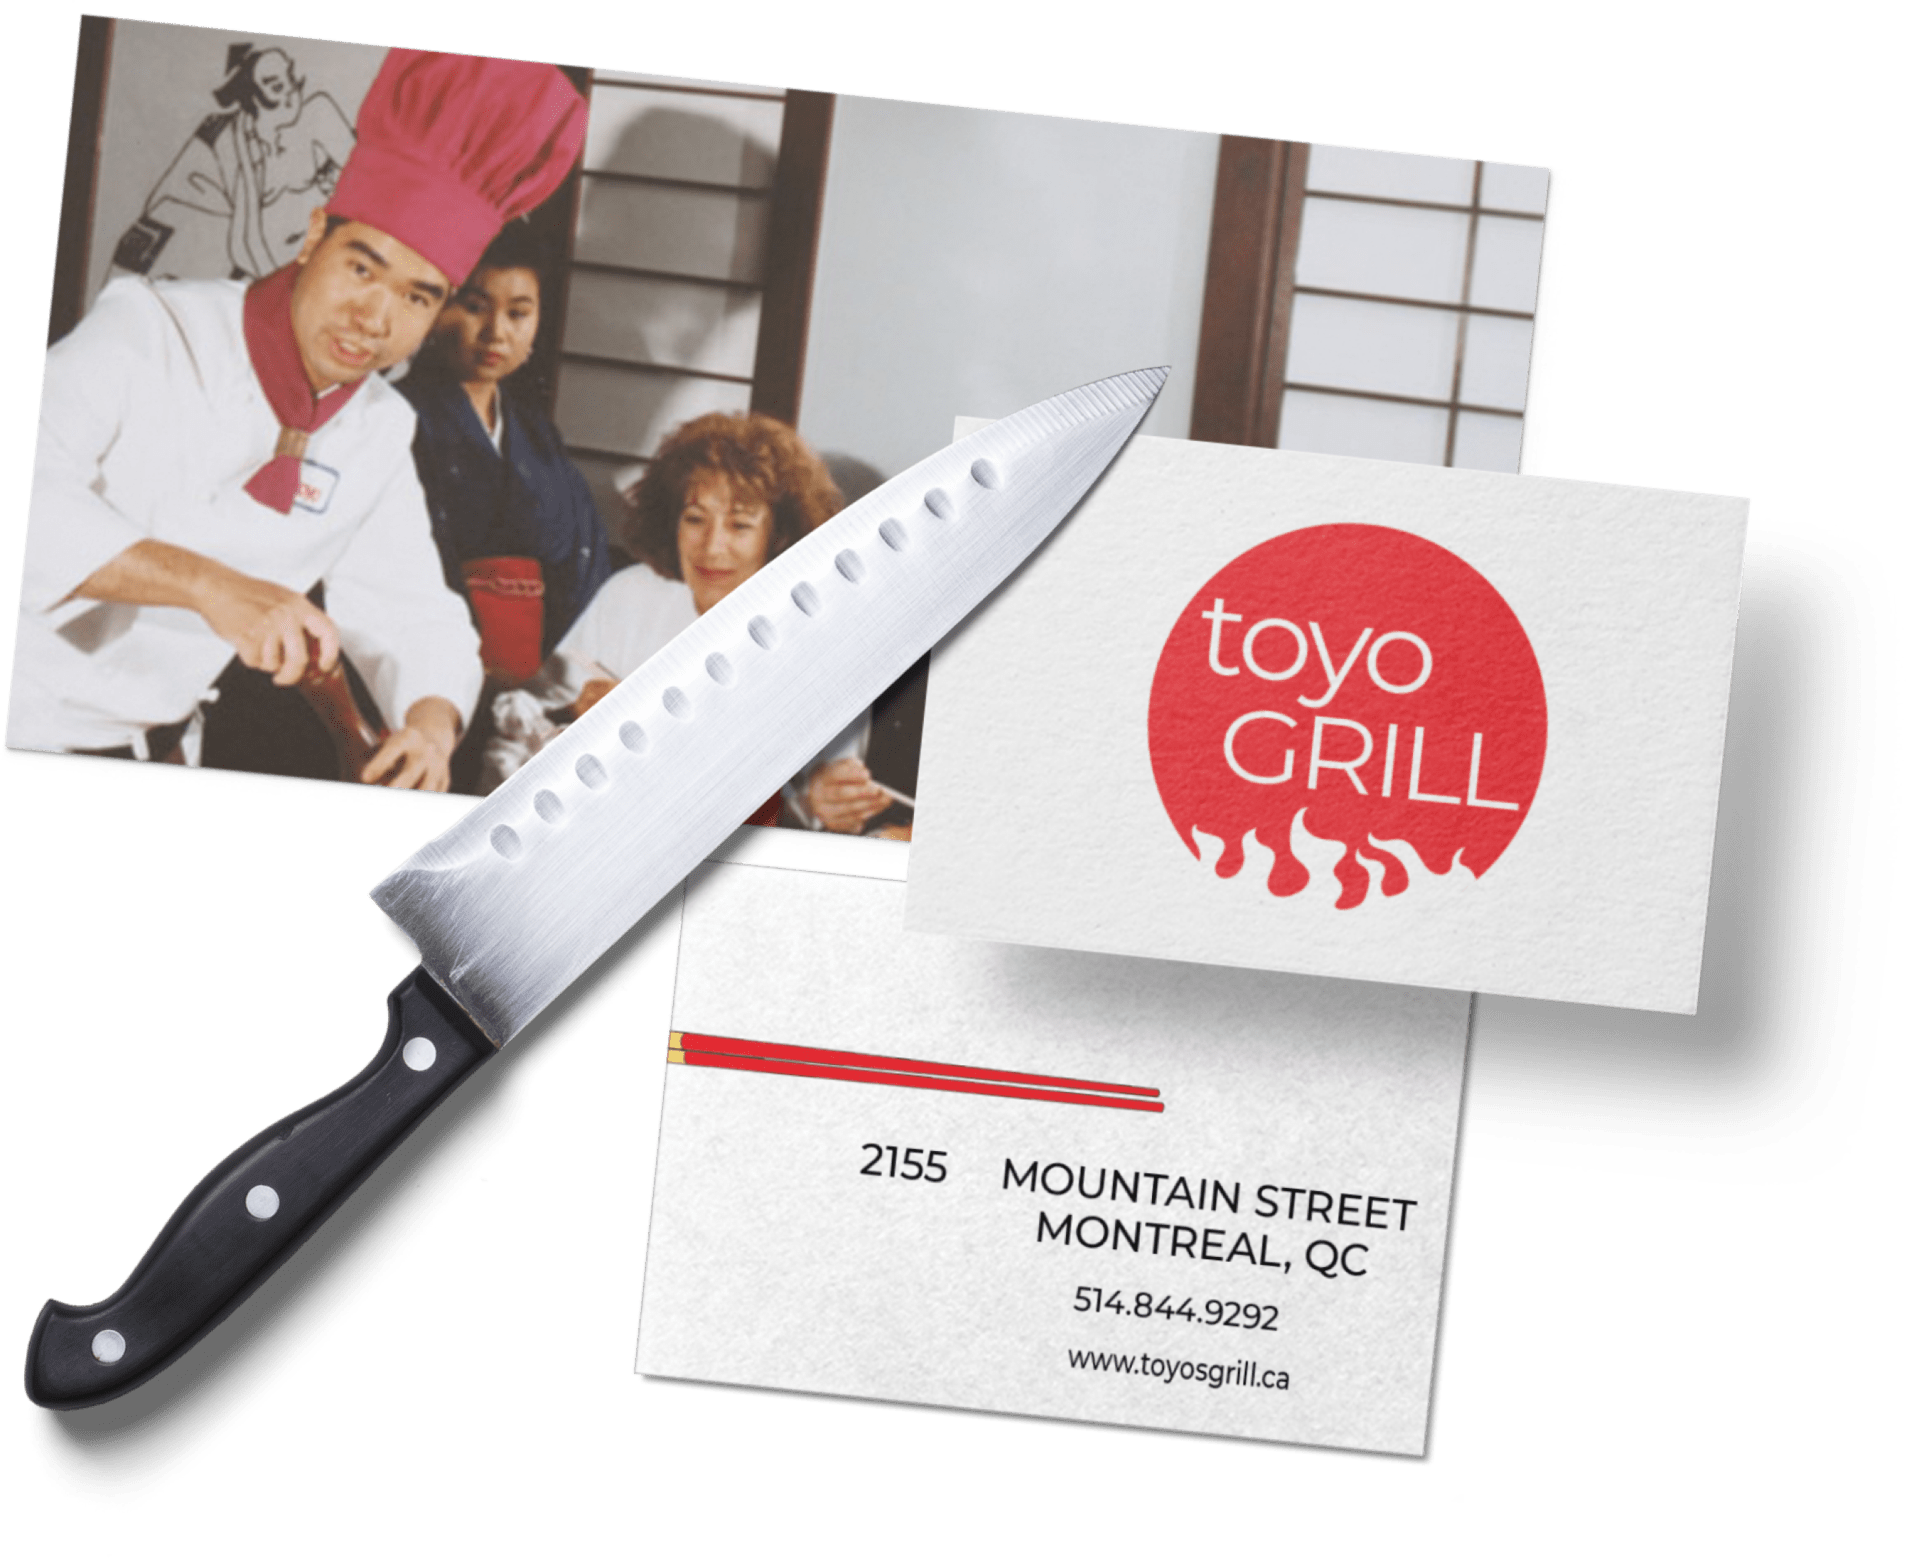 Toyo grill mockup